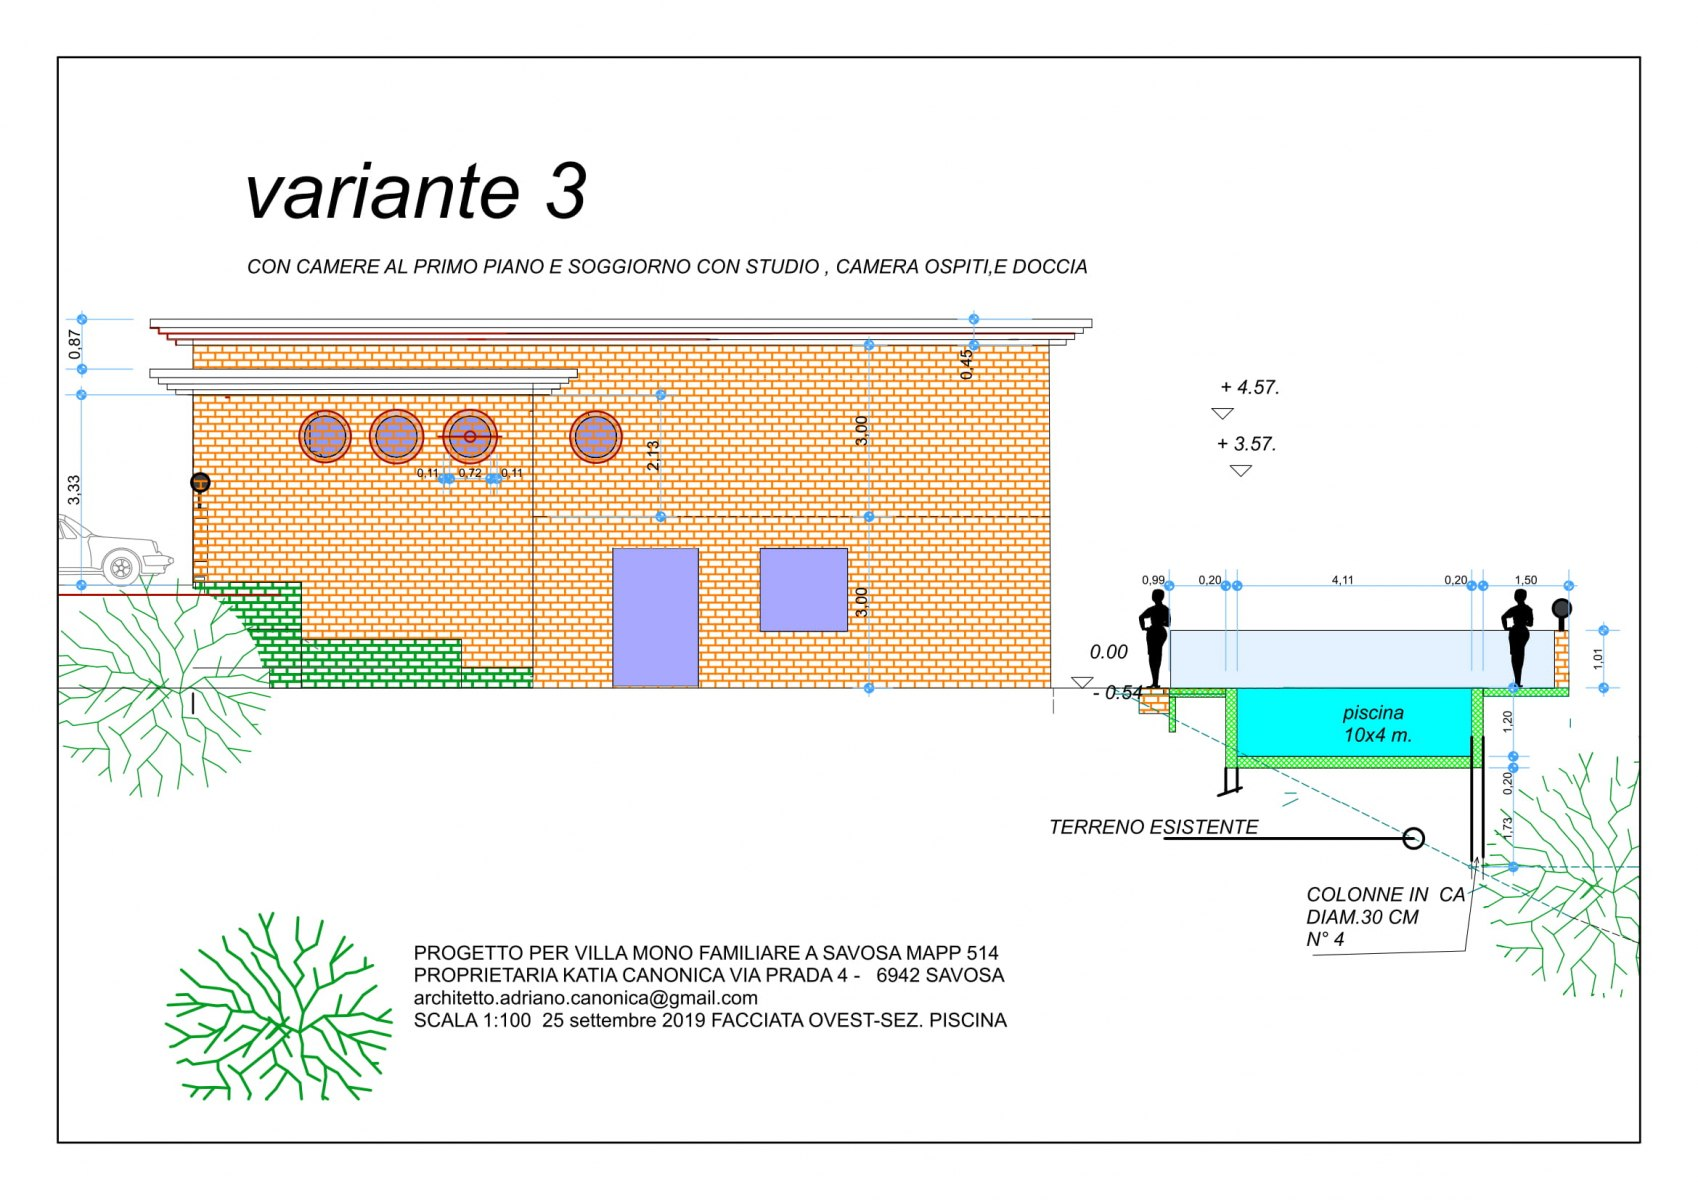 jacuzzi-terrazzo-facciata-ovest-1-100-1